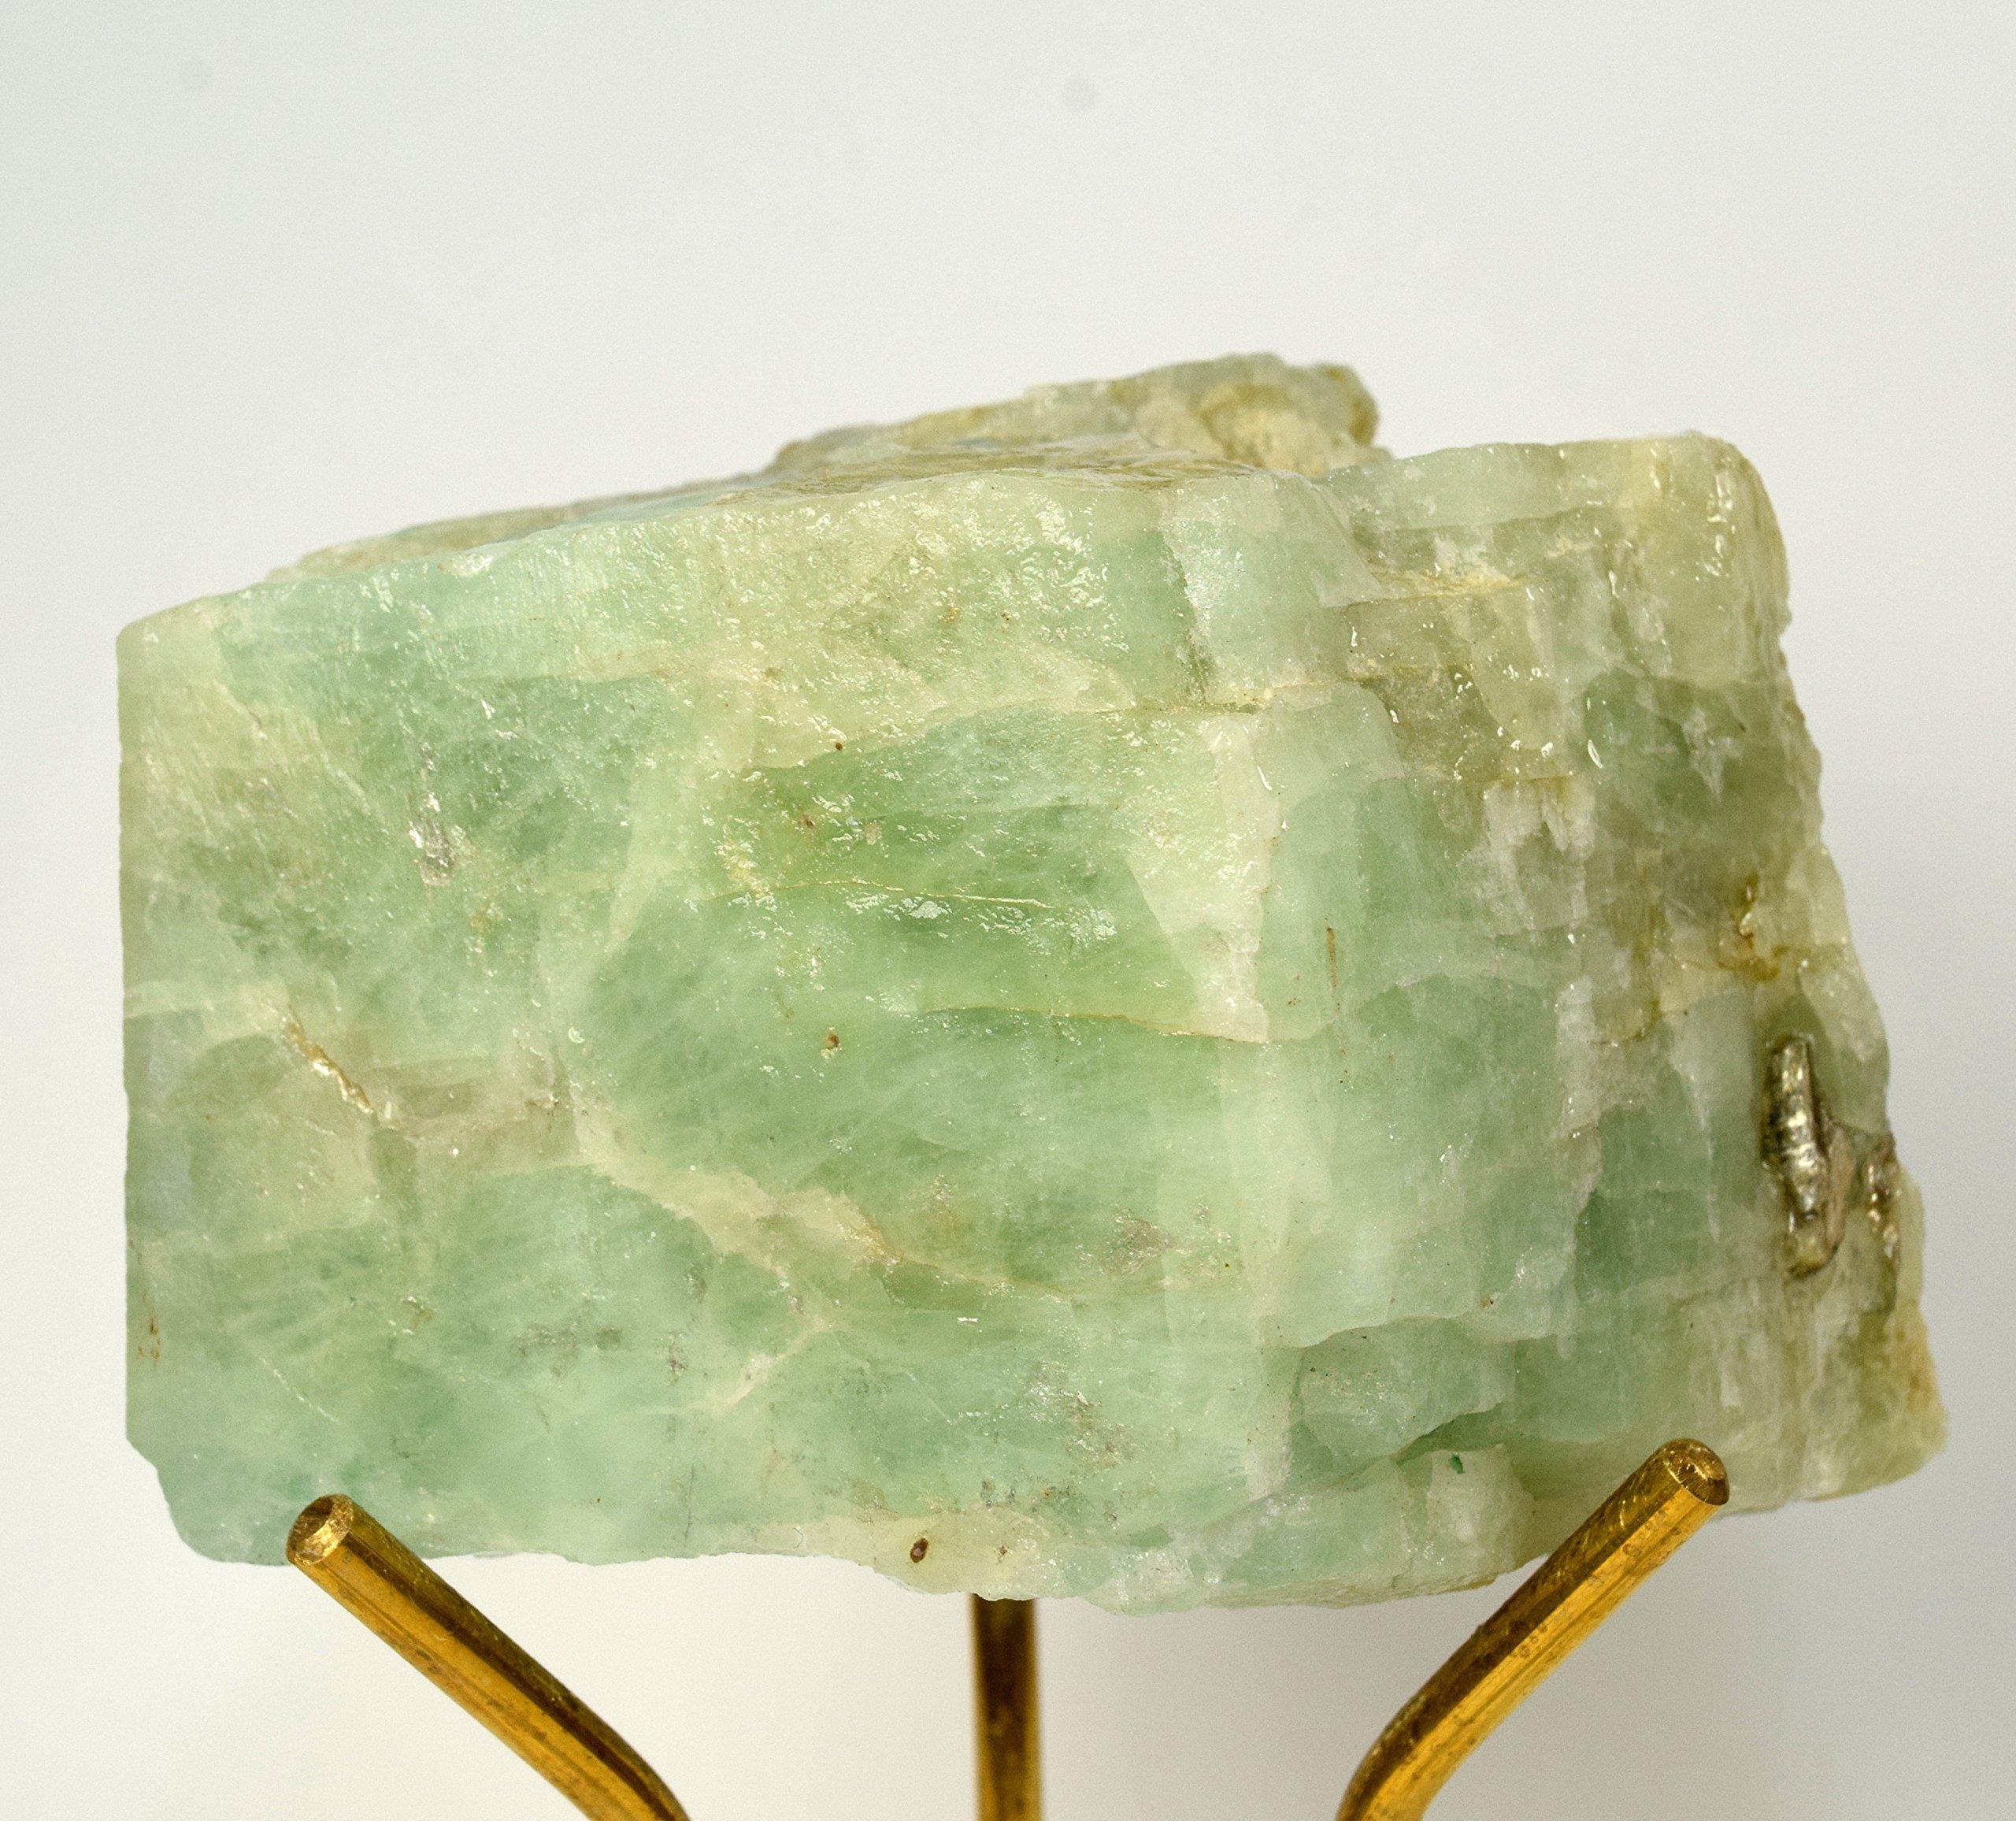 Large 2.1lb 4.3'' Aquamarine Rough Natural Beryl Emerald Crystal Stone Cabochon Greenish Blue Yellow Sparkling Mineral Gemstone Specimen - Brazil